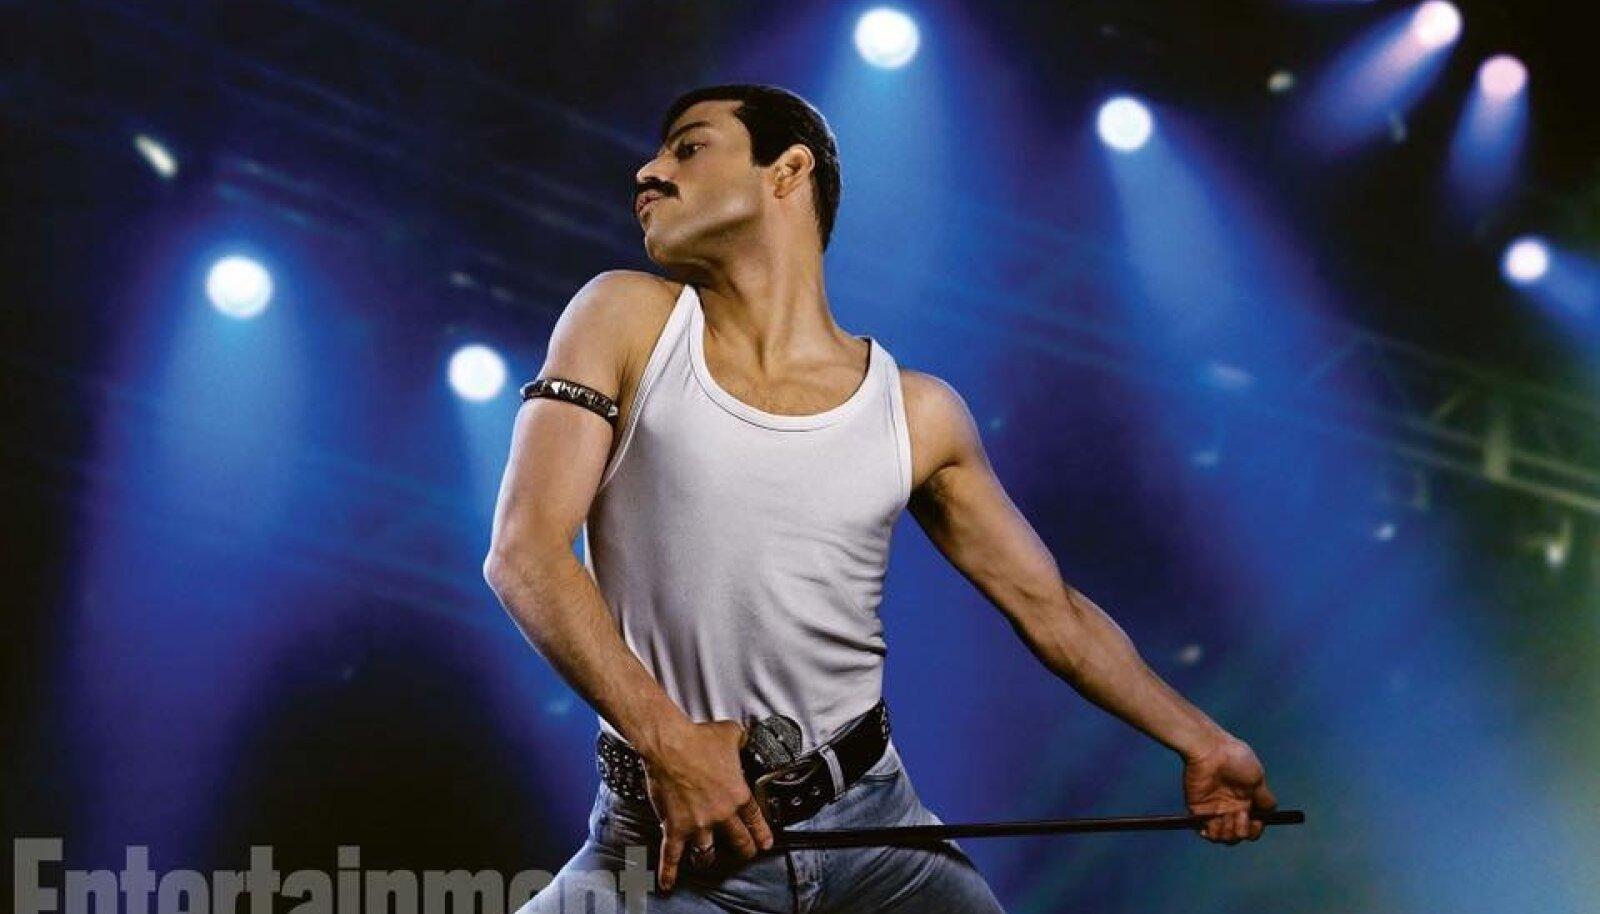 Rami Malek on Freddie Mercury filmis Bohemian Rhapsody (2018)